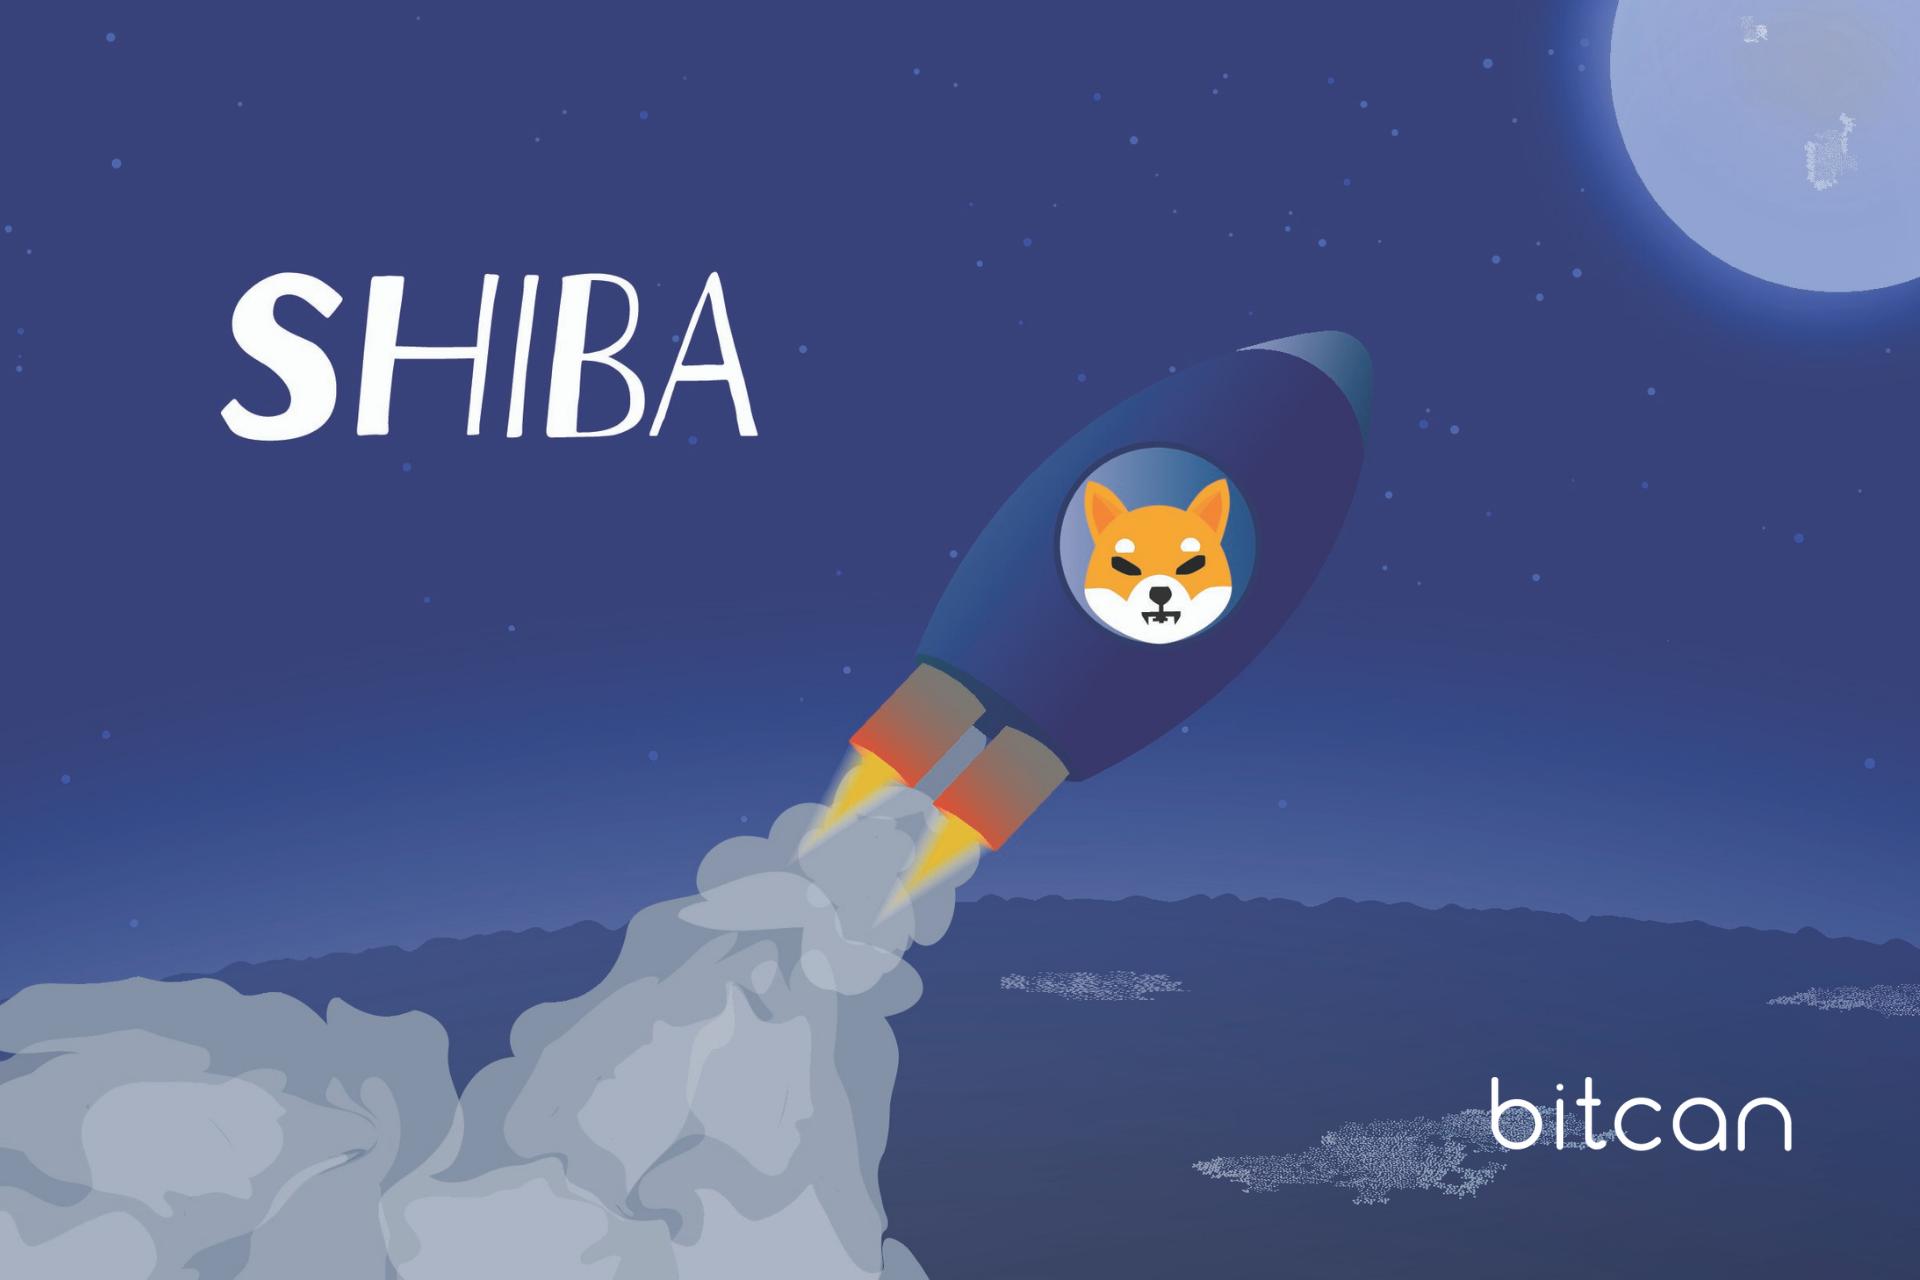 Shiba Inu (SHIB). Podróbka Dogecoina (DOGE), która zyskuje miliony procent